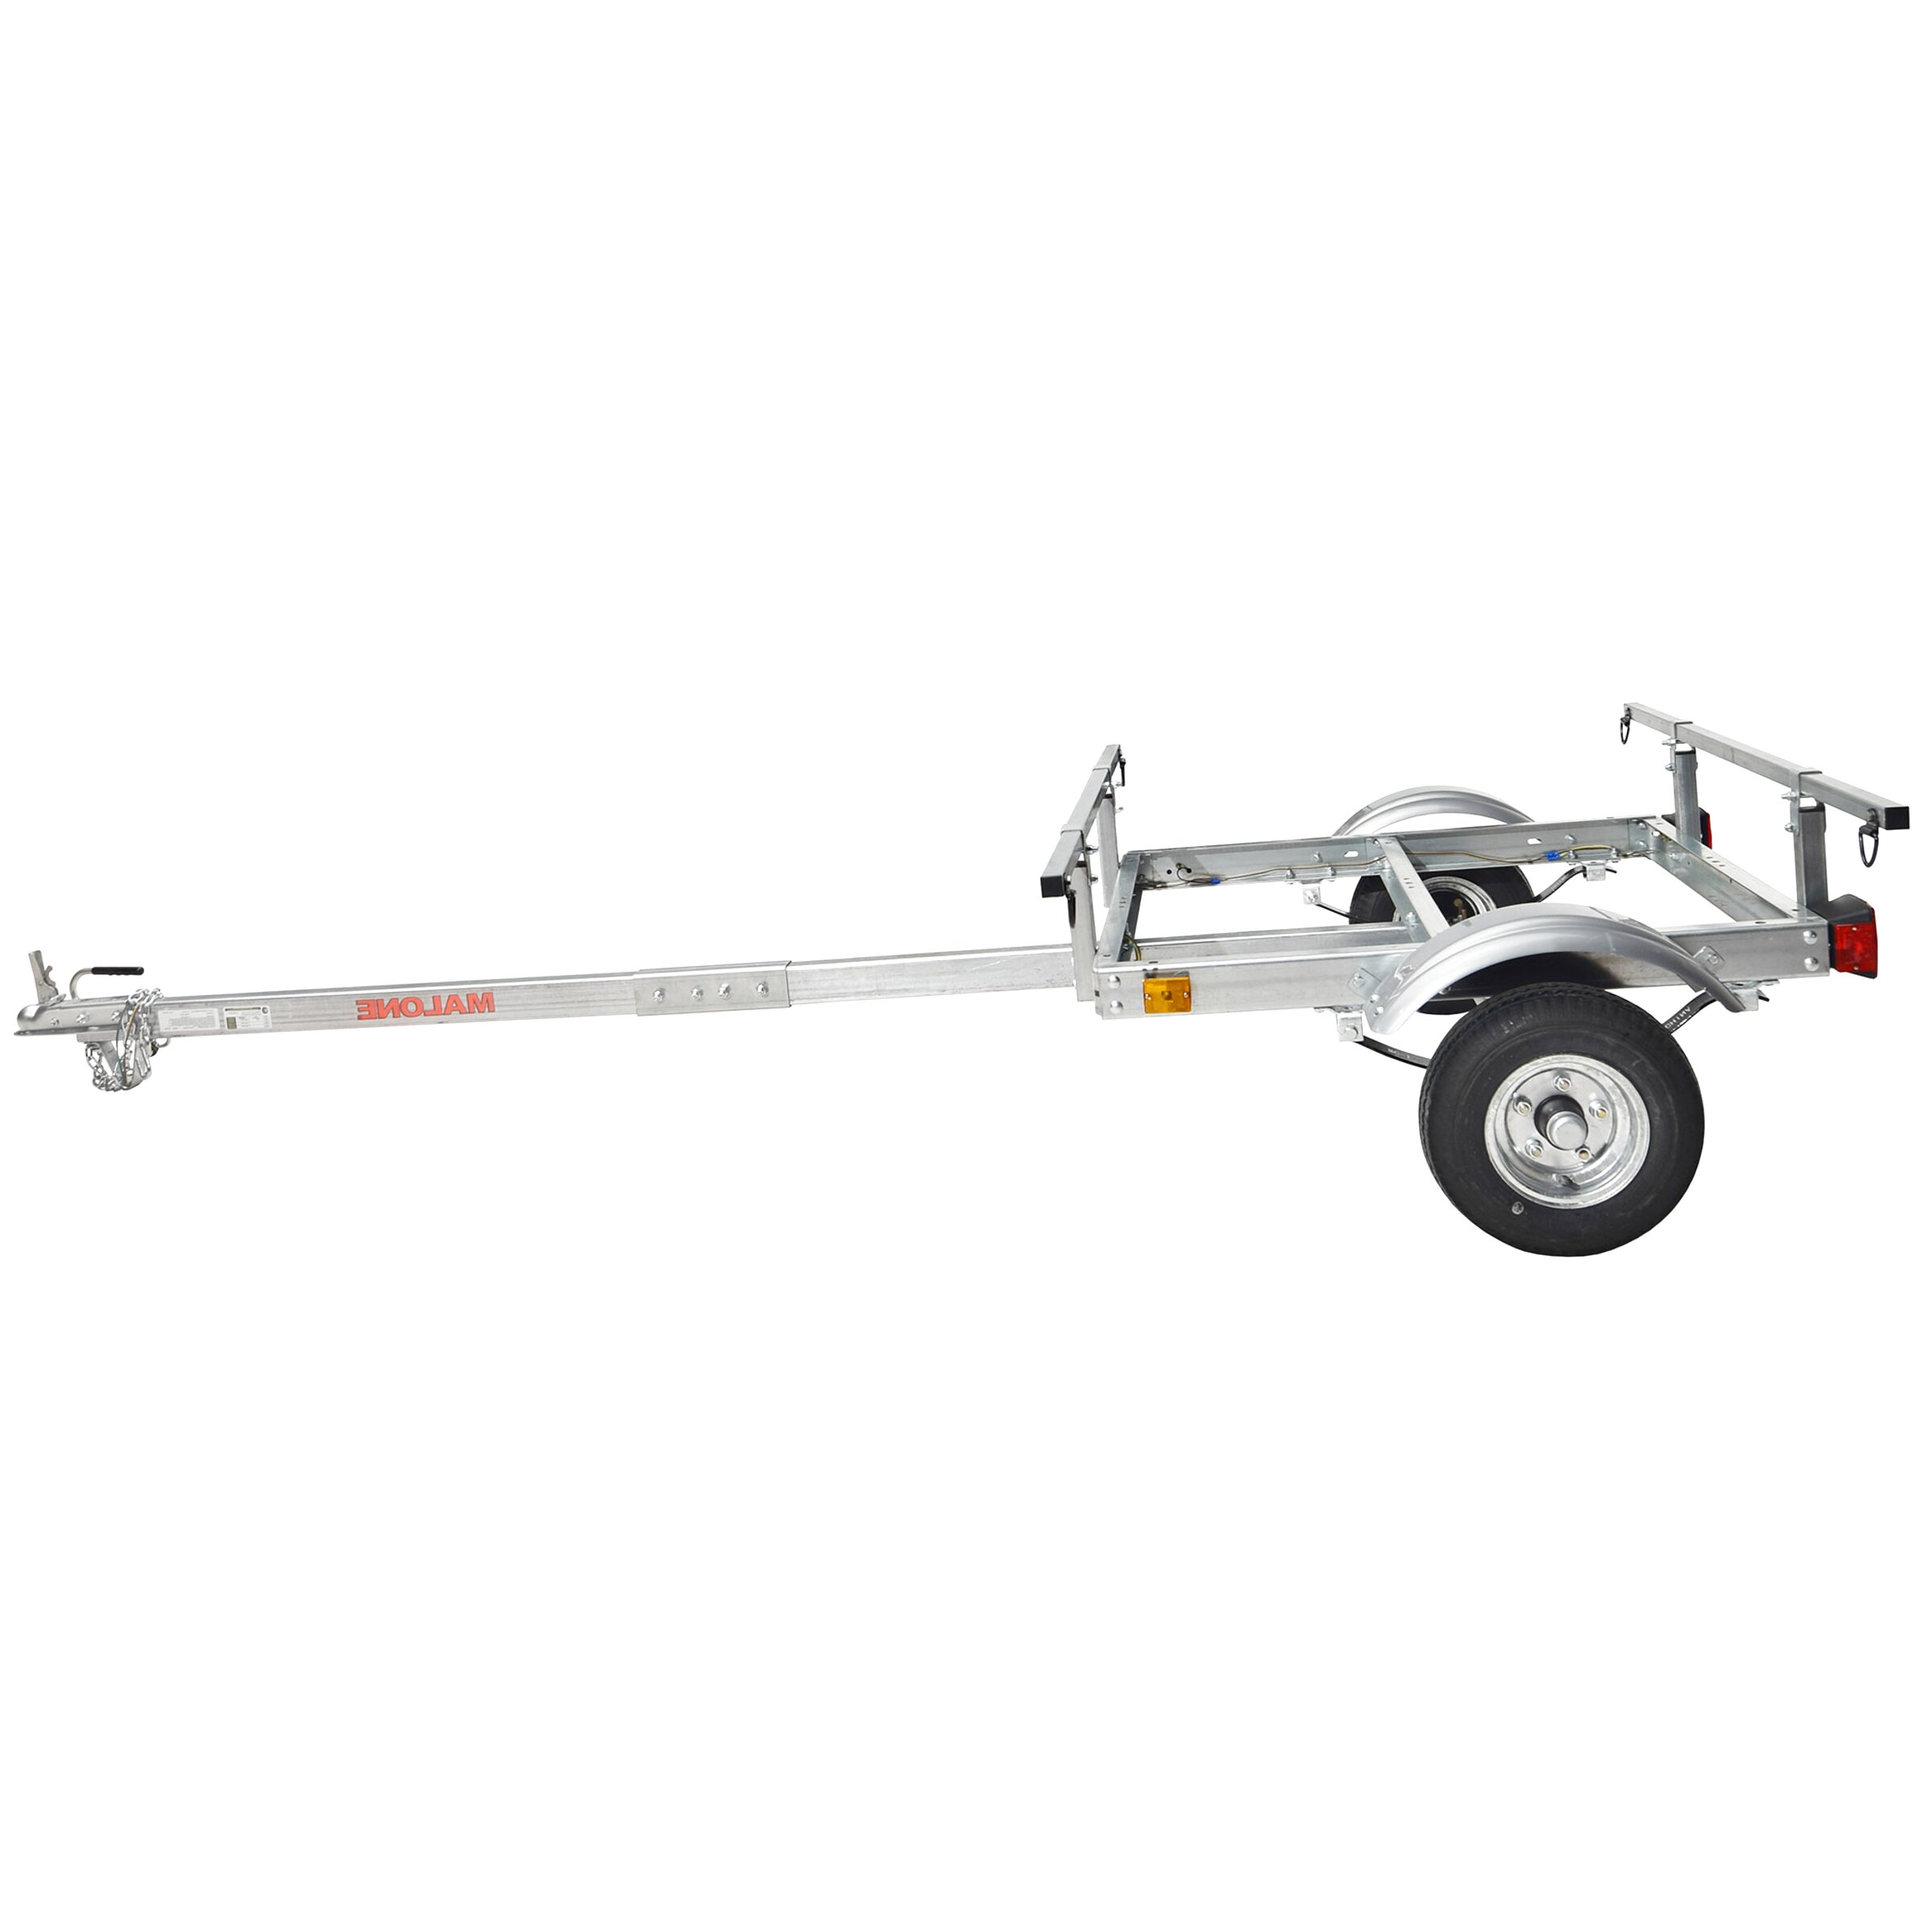 kayak trailer for sale